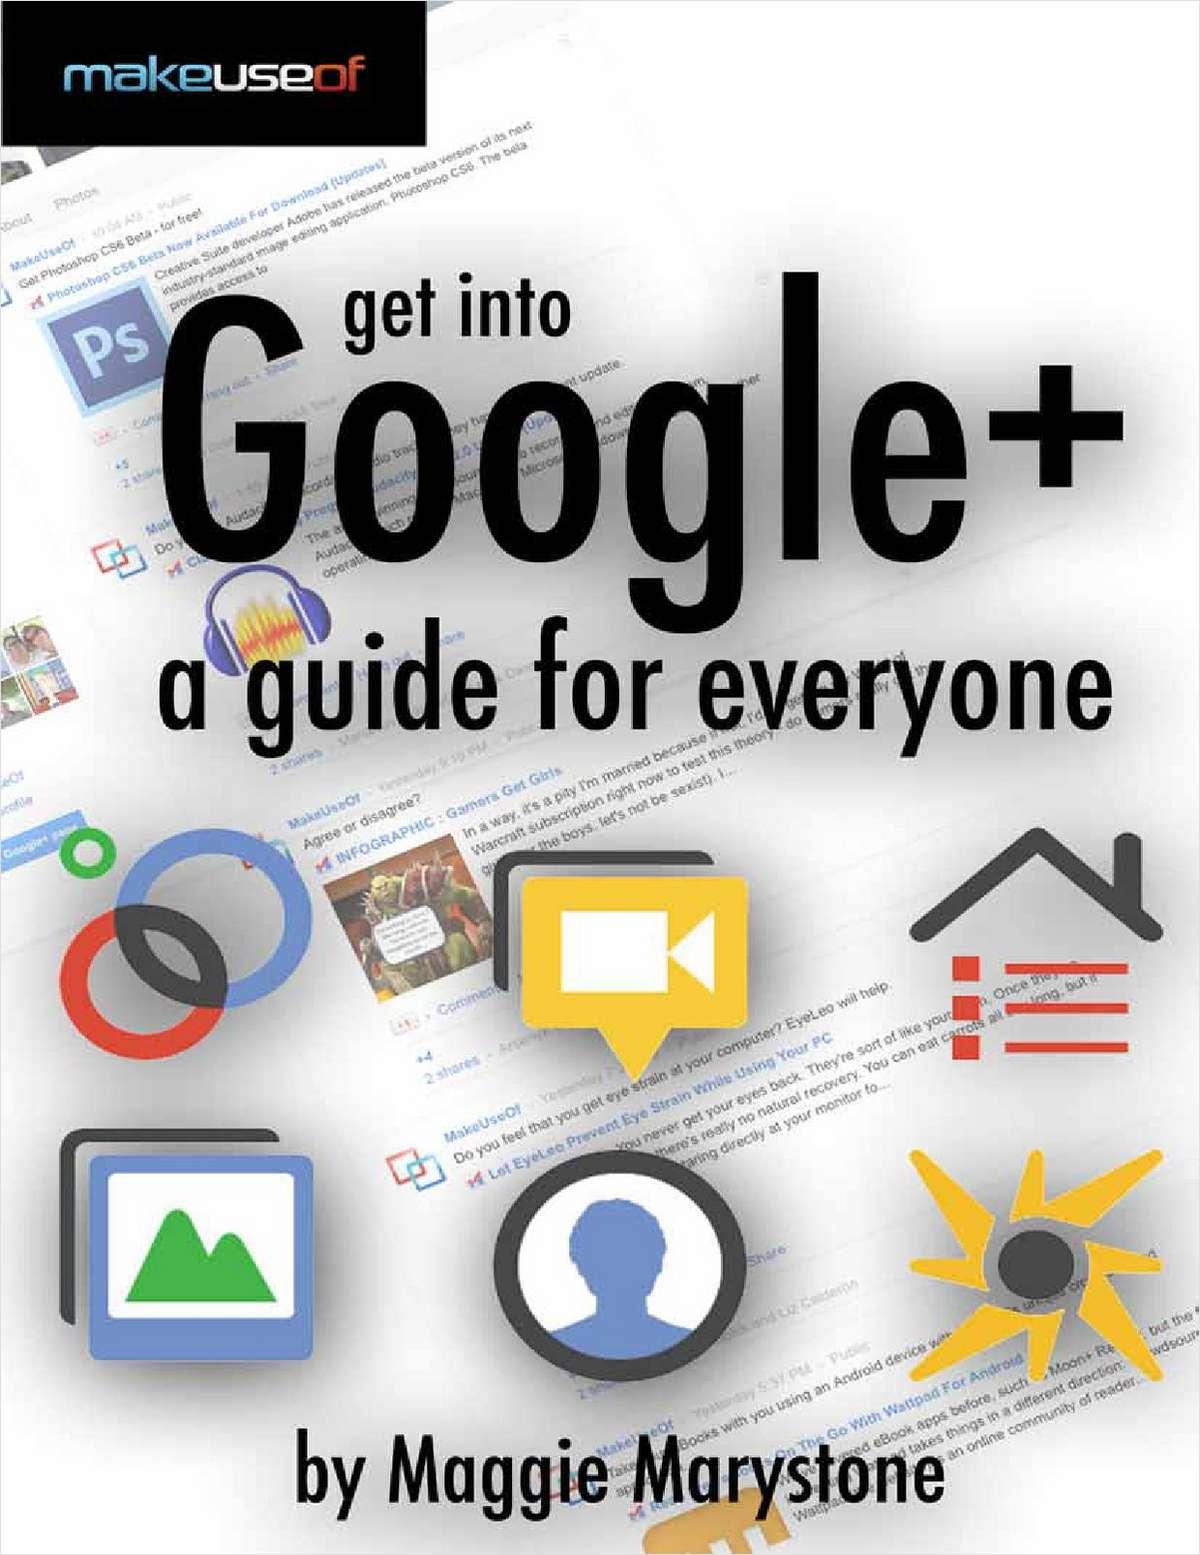 Get into Google+